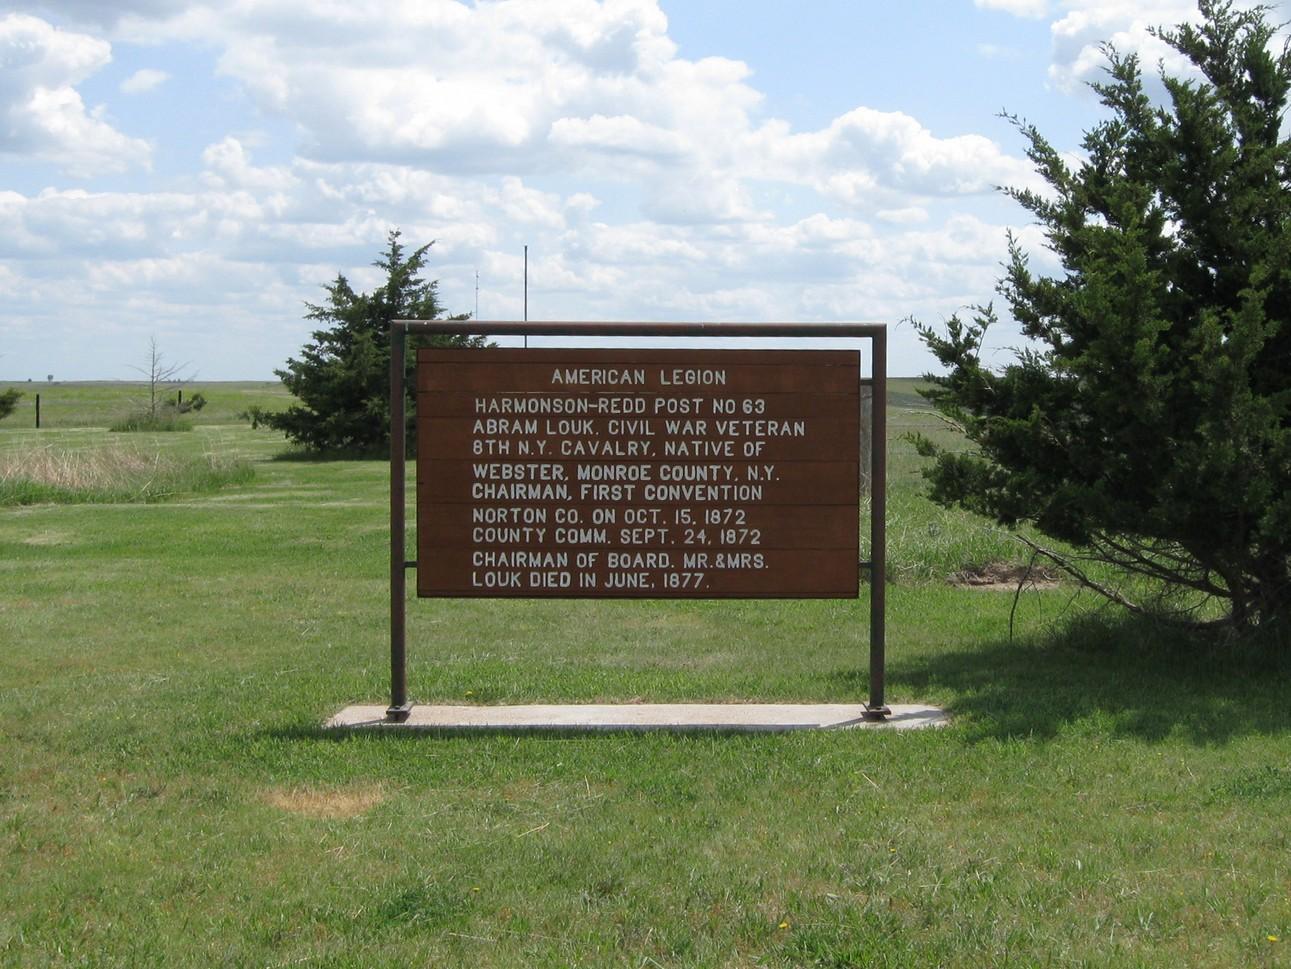 Photo of Louk sign